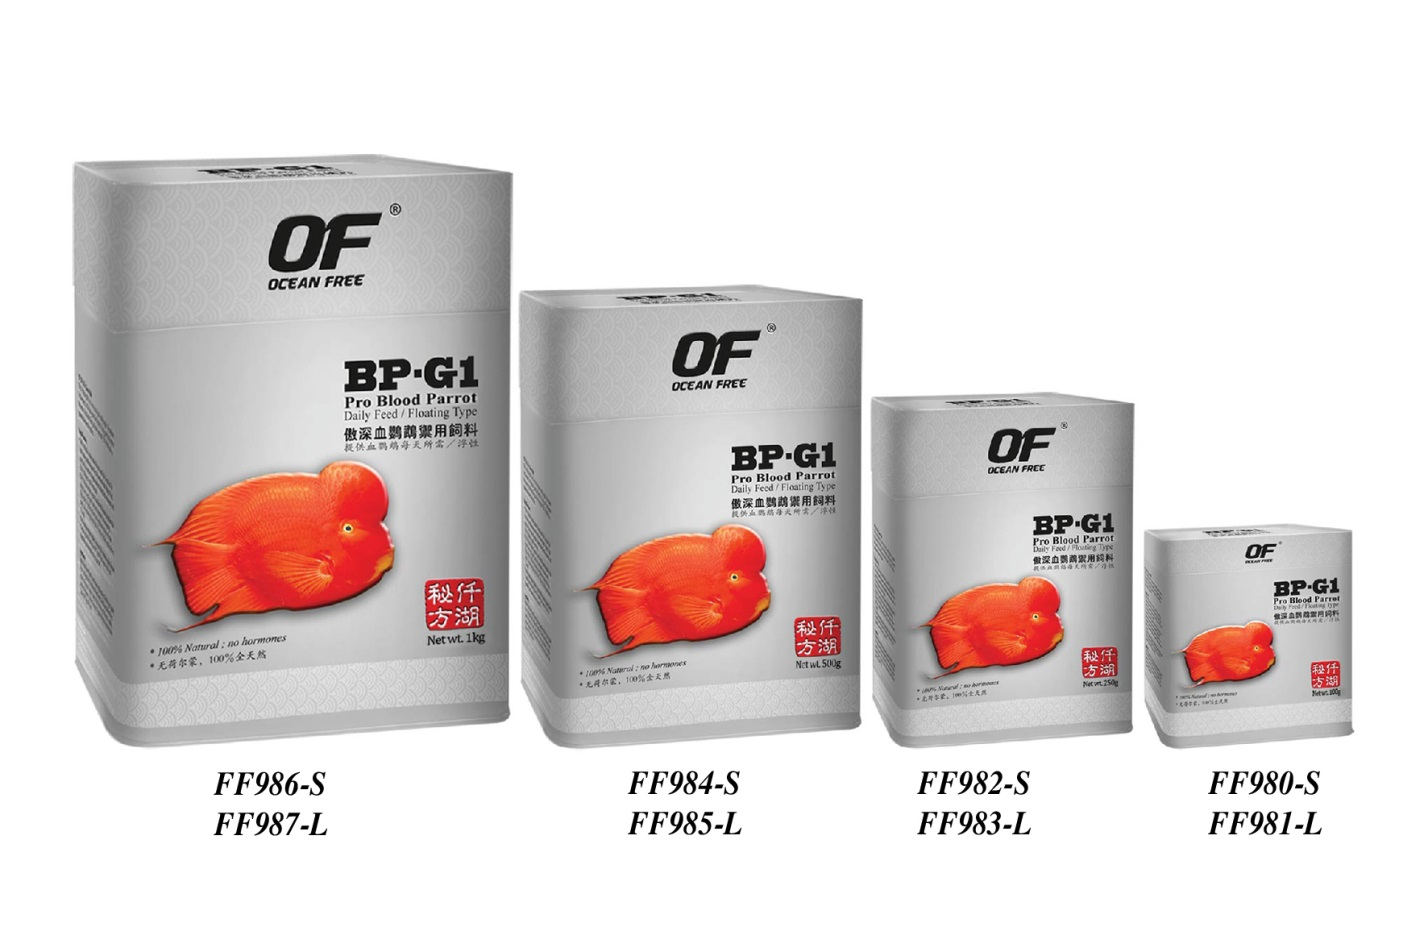 Buy BP-G1 (Pro Blood Parrot)